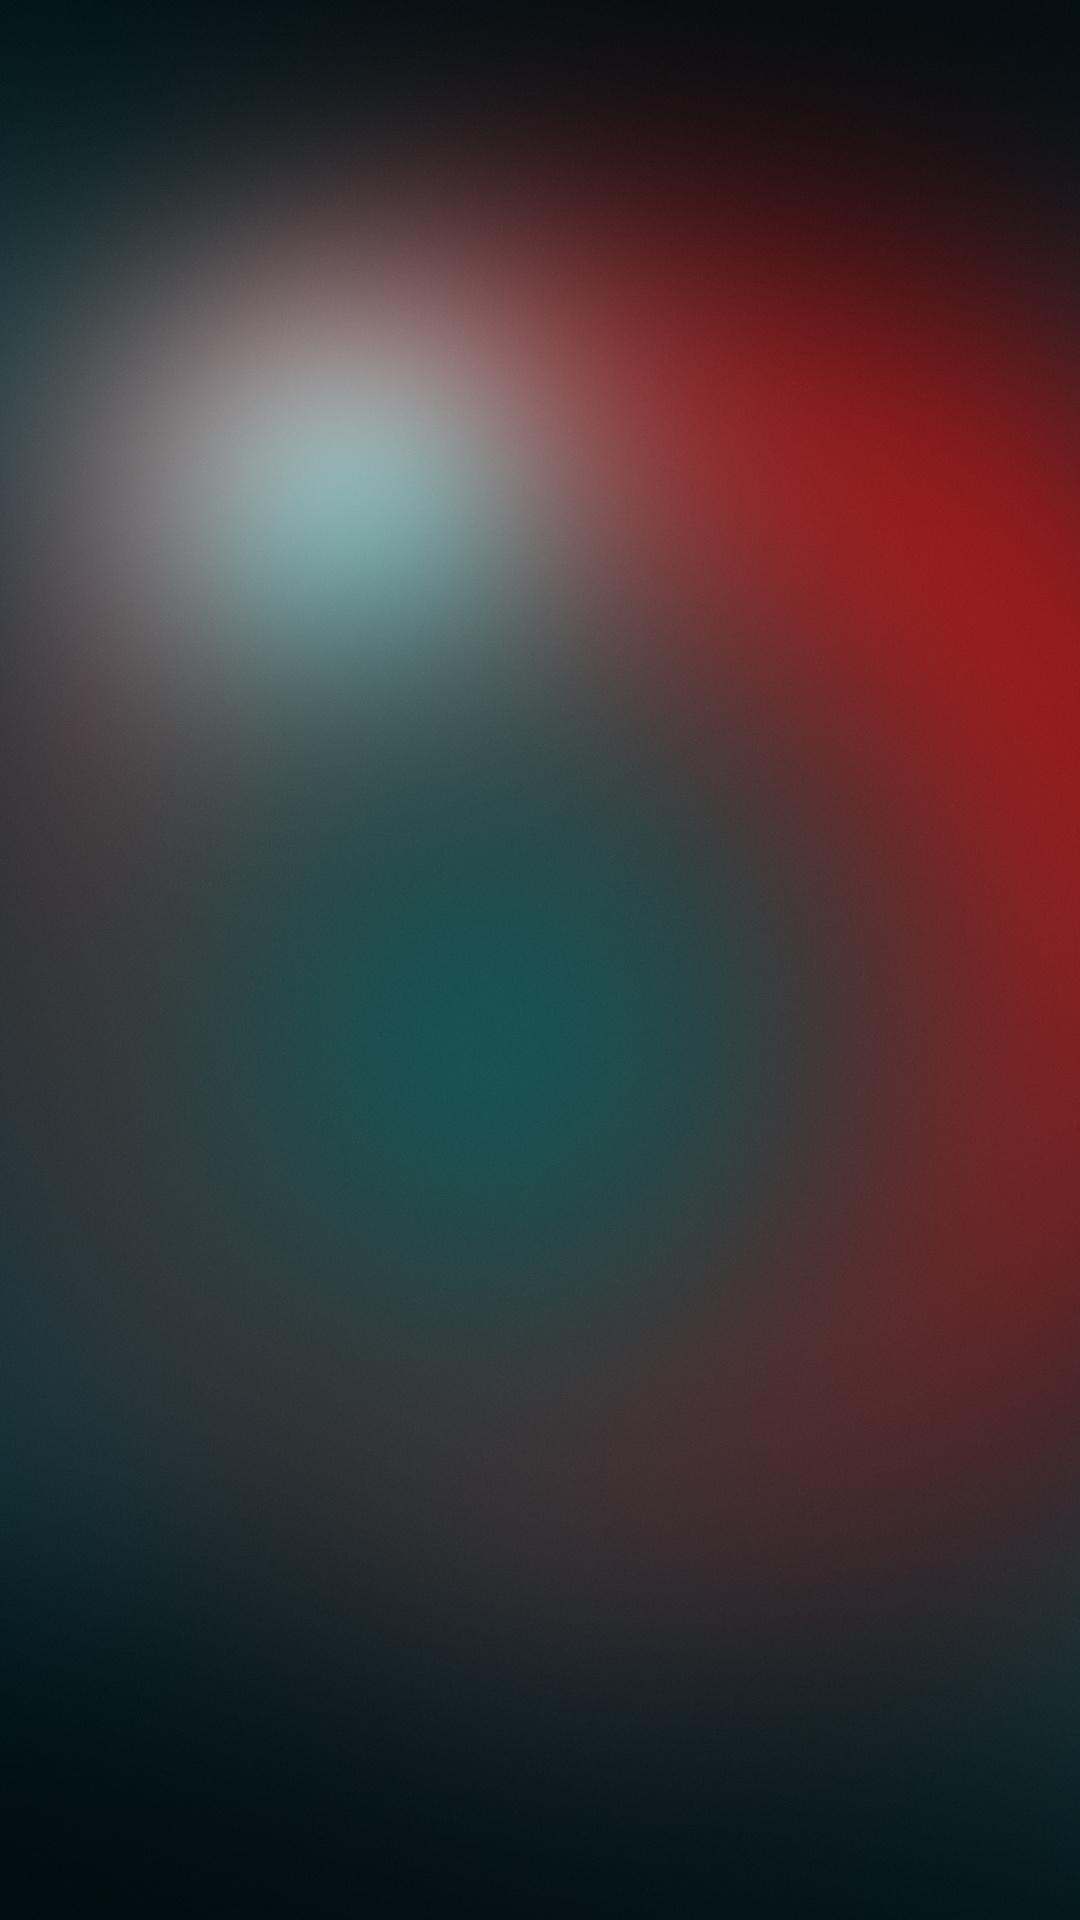 blur-abstract-background-4k-l2.jpg